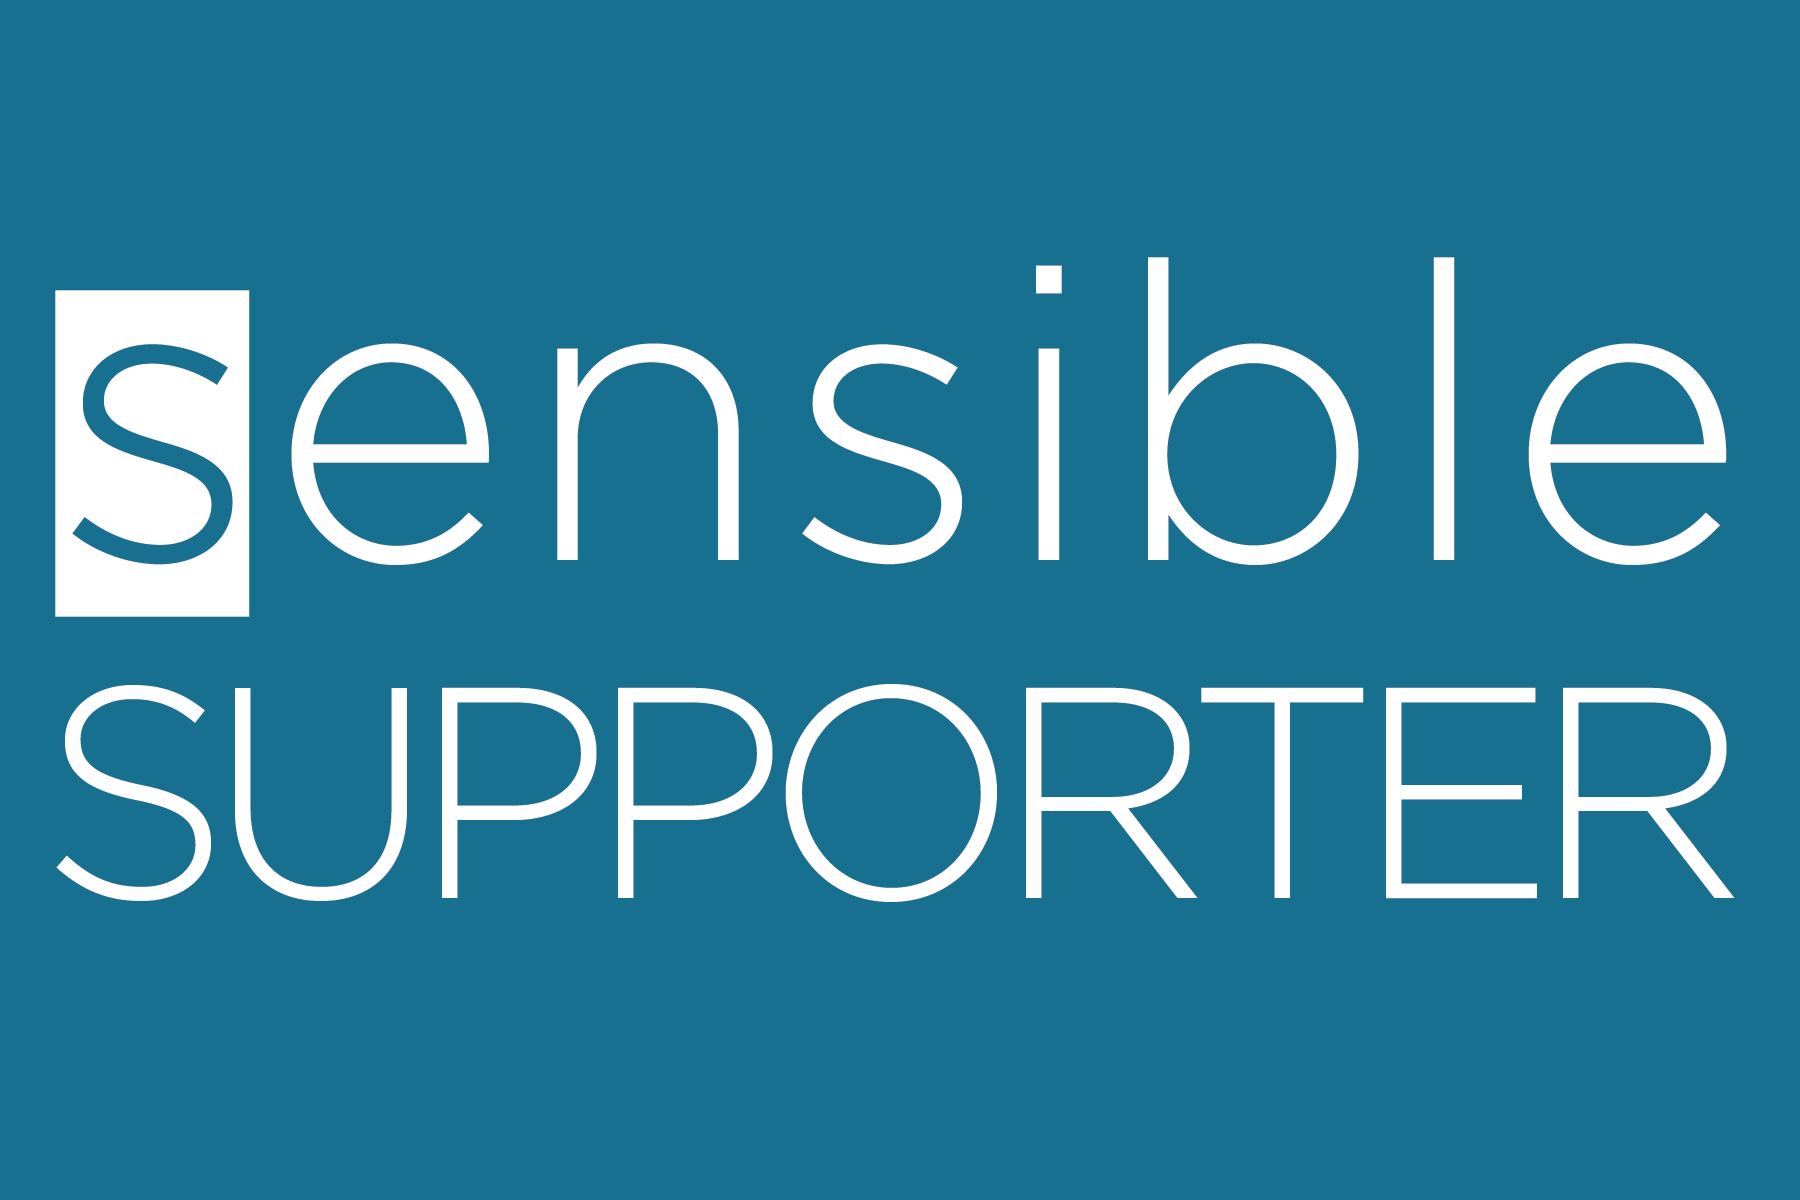 Sensible Supporter